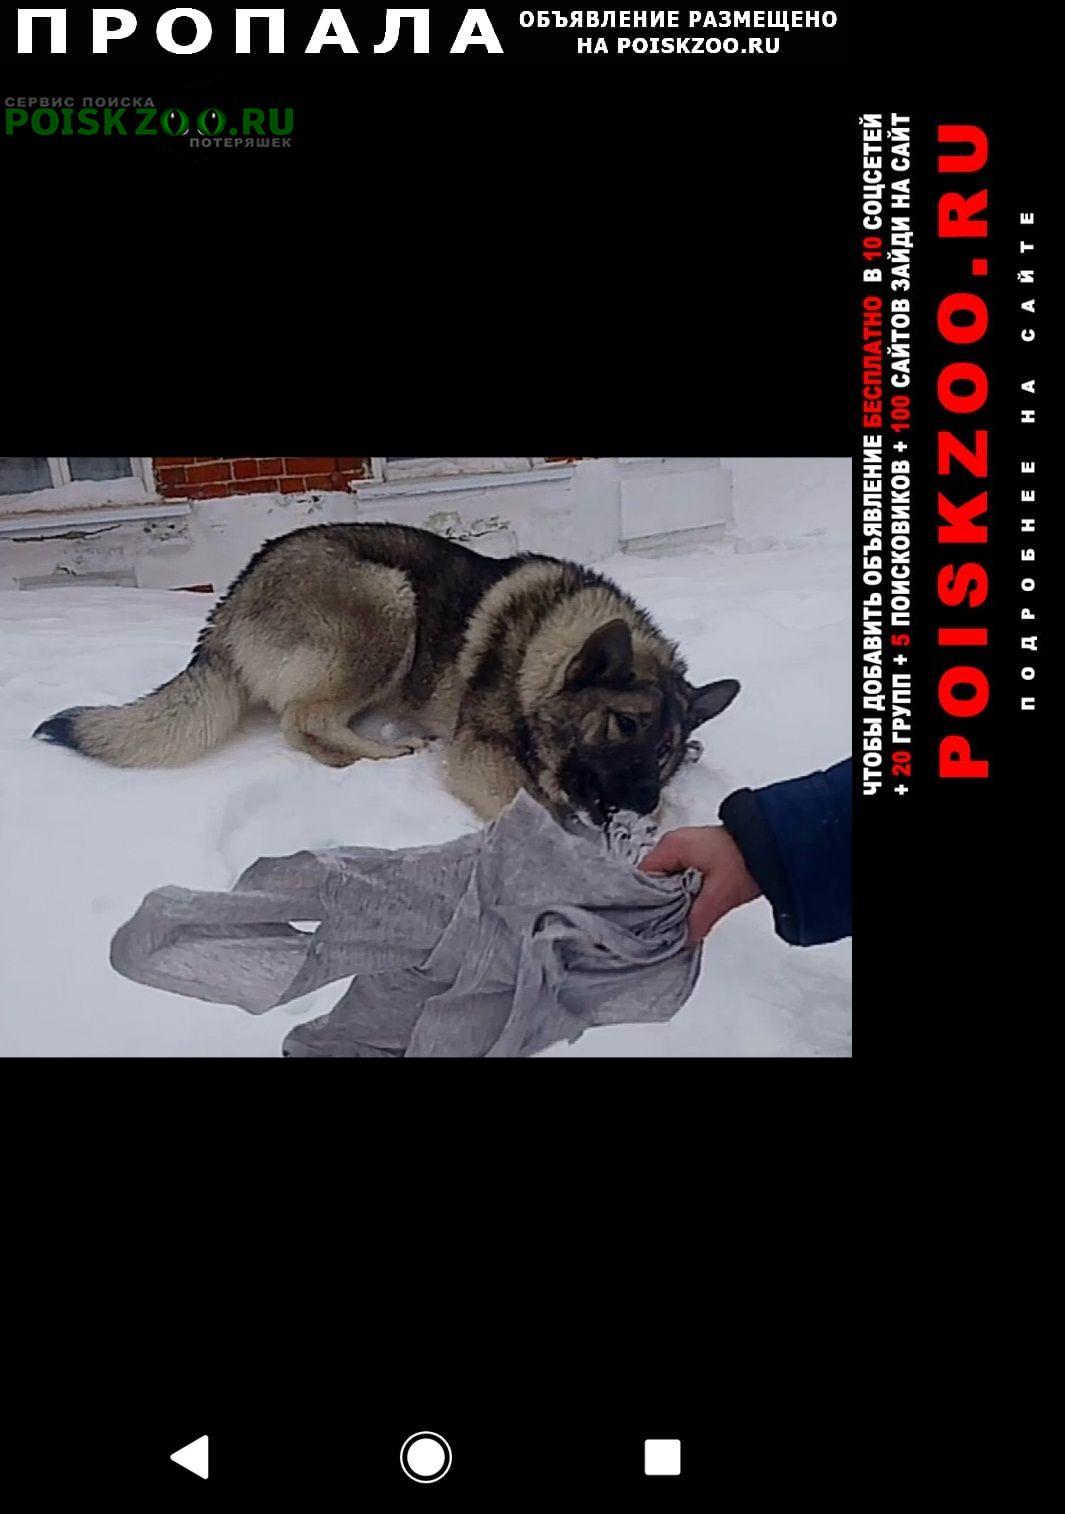 Пропала собака кличка буля, 7 месяцев Истра